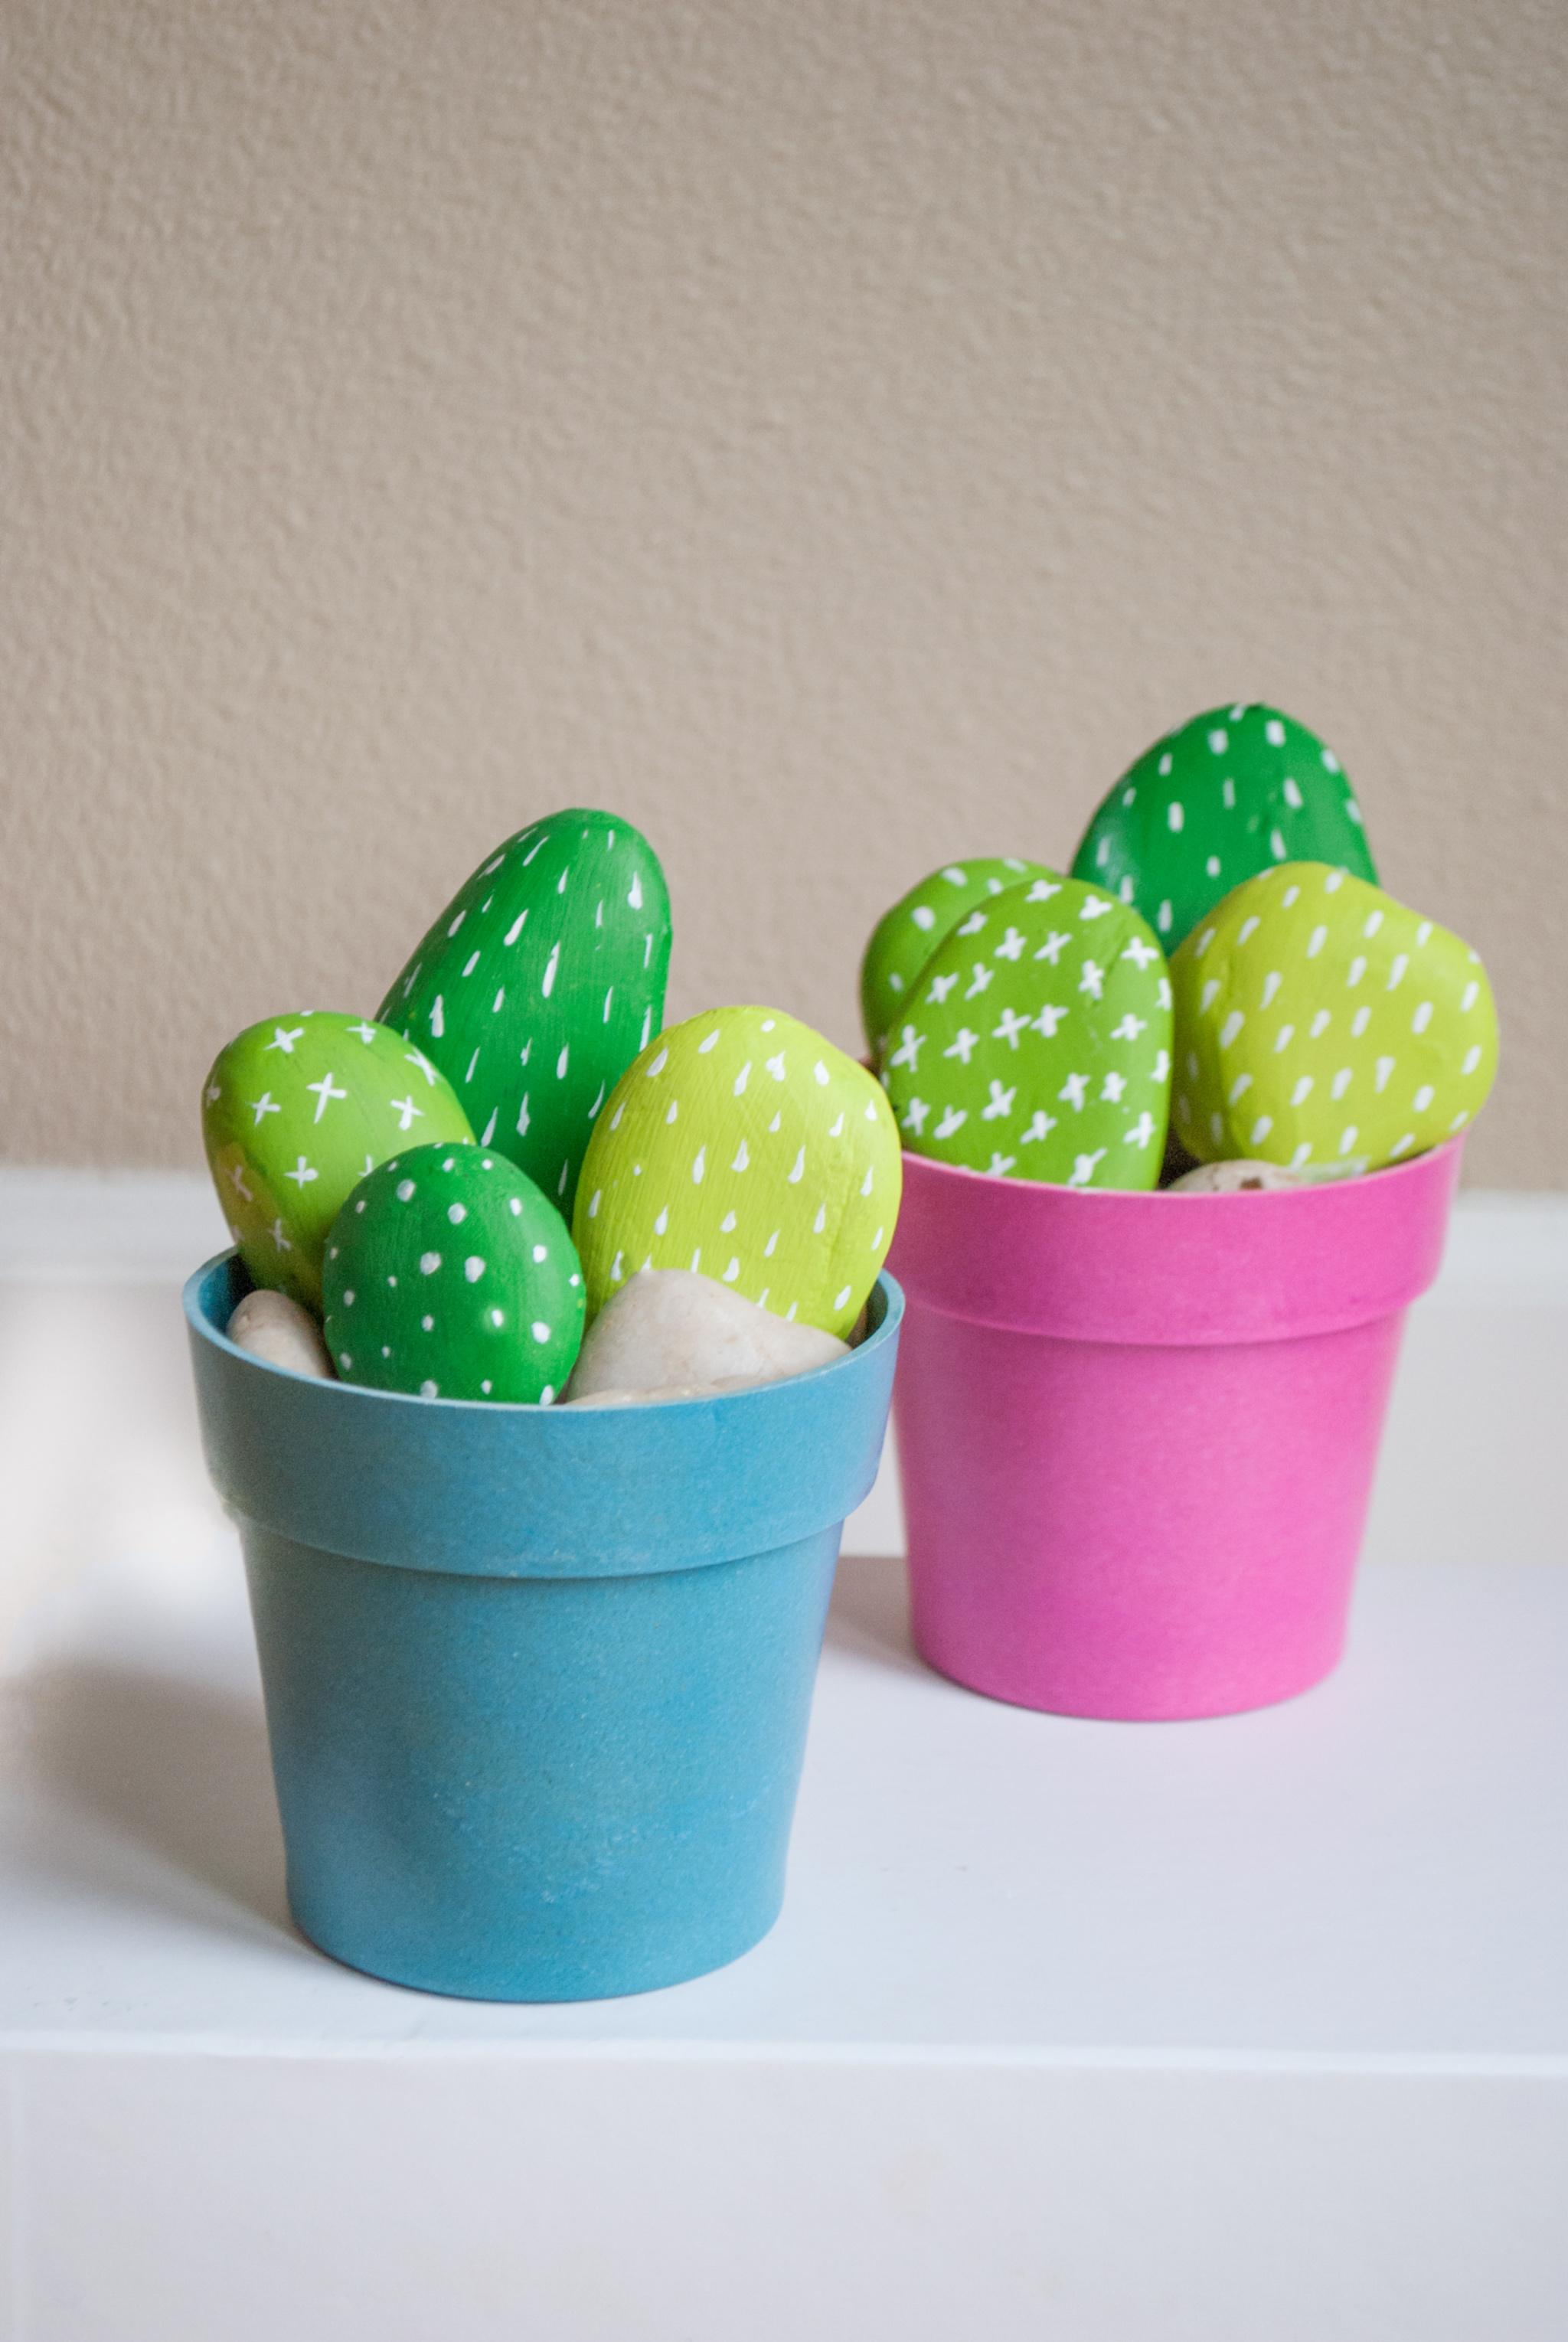 DIY Painted Rock Cactus